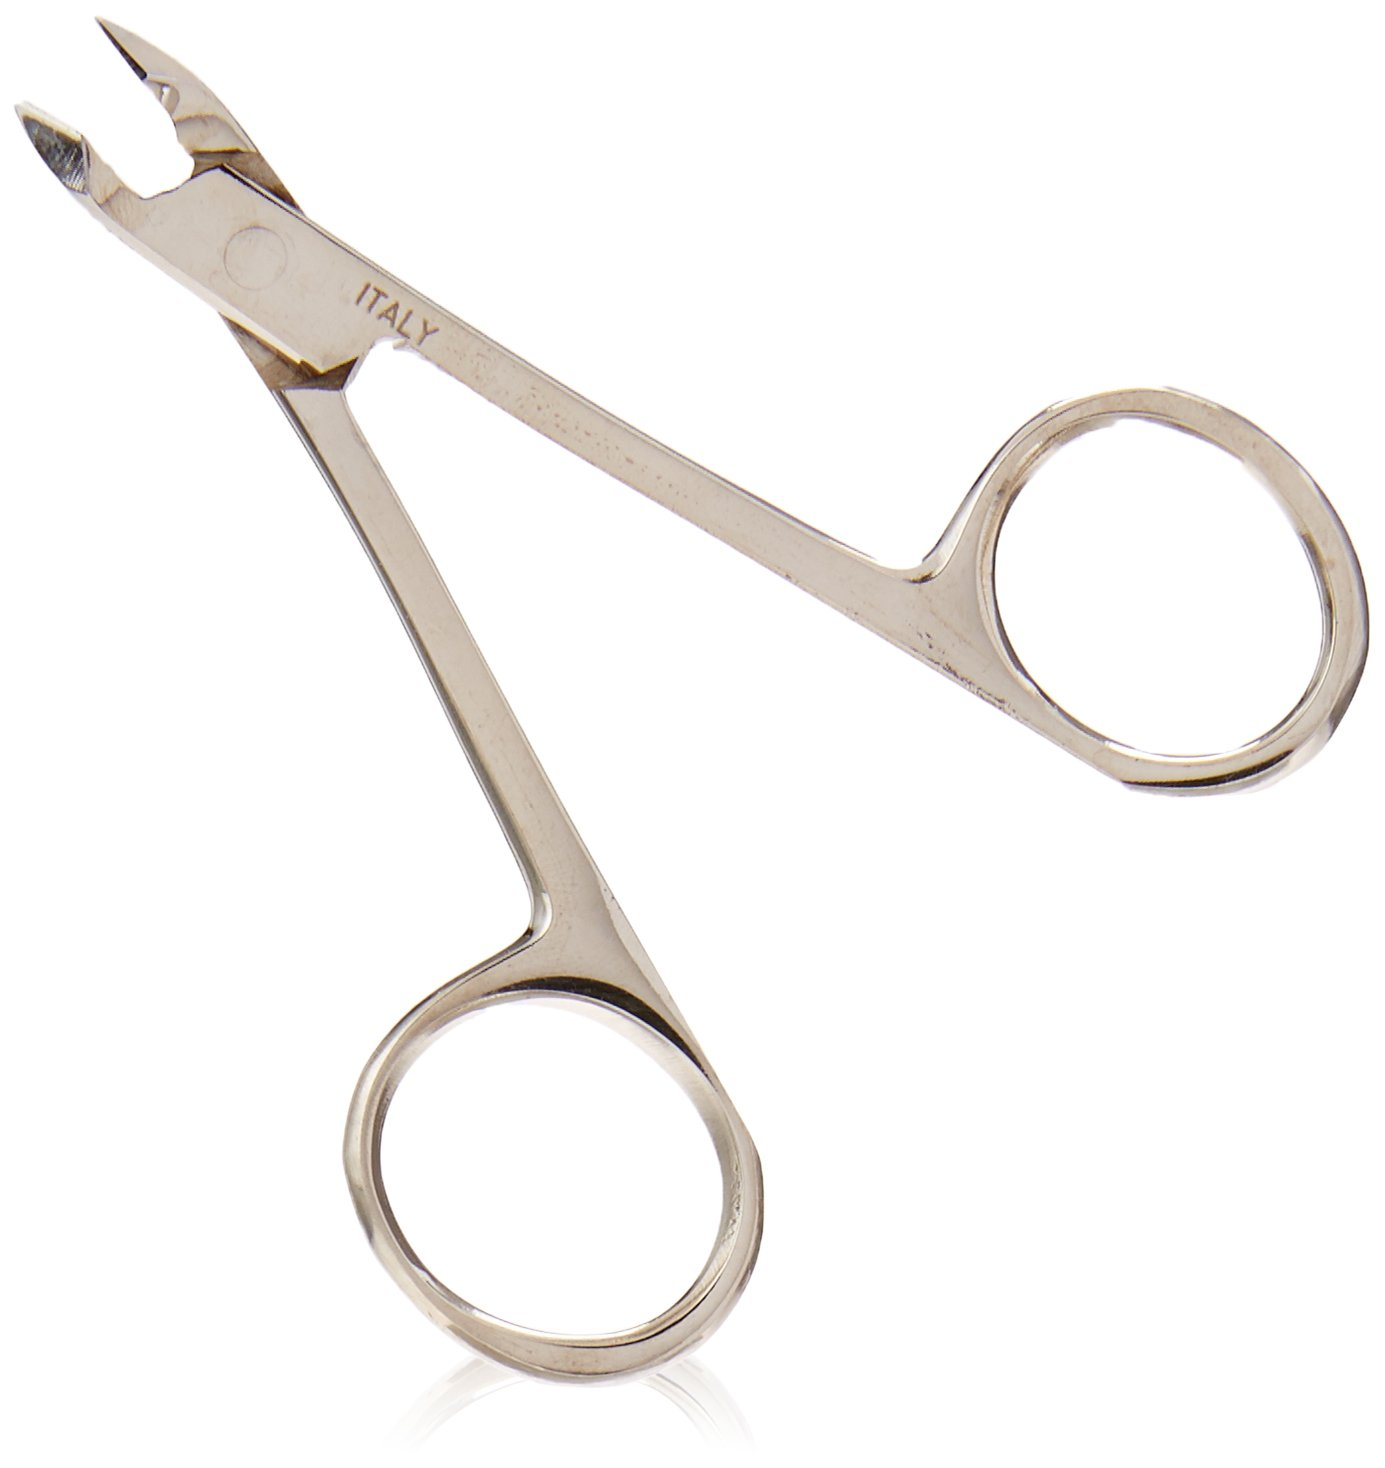 Denco Cuticle Nipper, 3.25-Inch 2404N